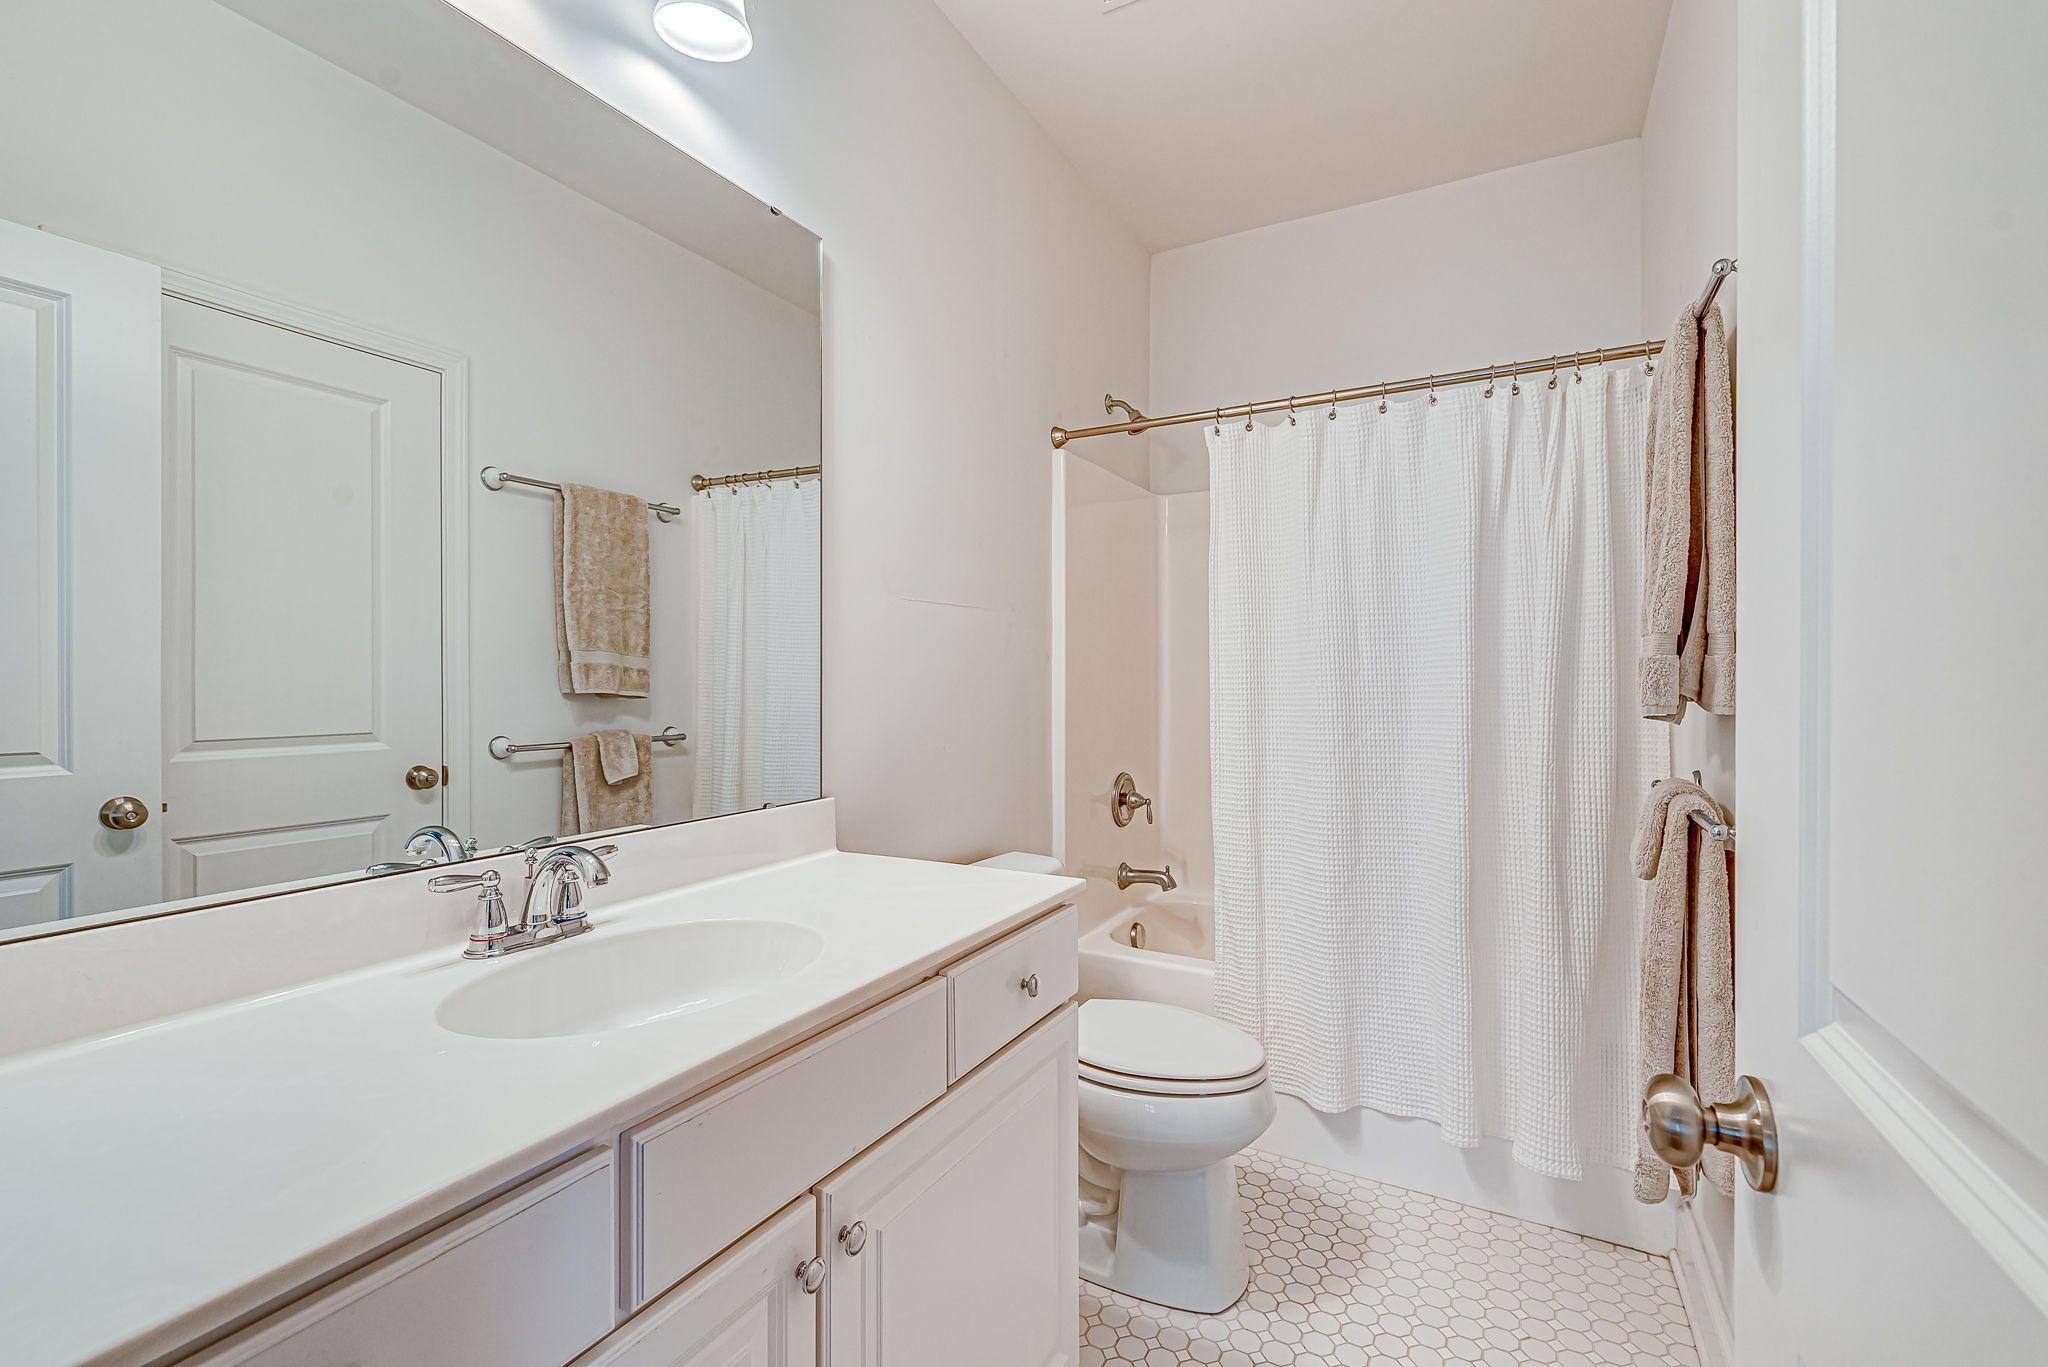 Dunes West Homes For Sale - 2476 Kings Gate, Mount Pleasant, SC - 36